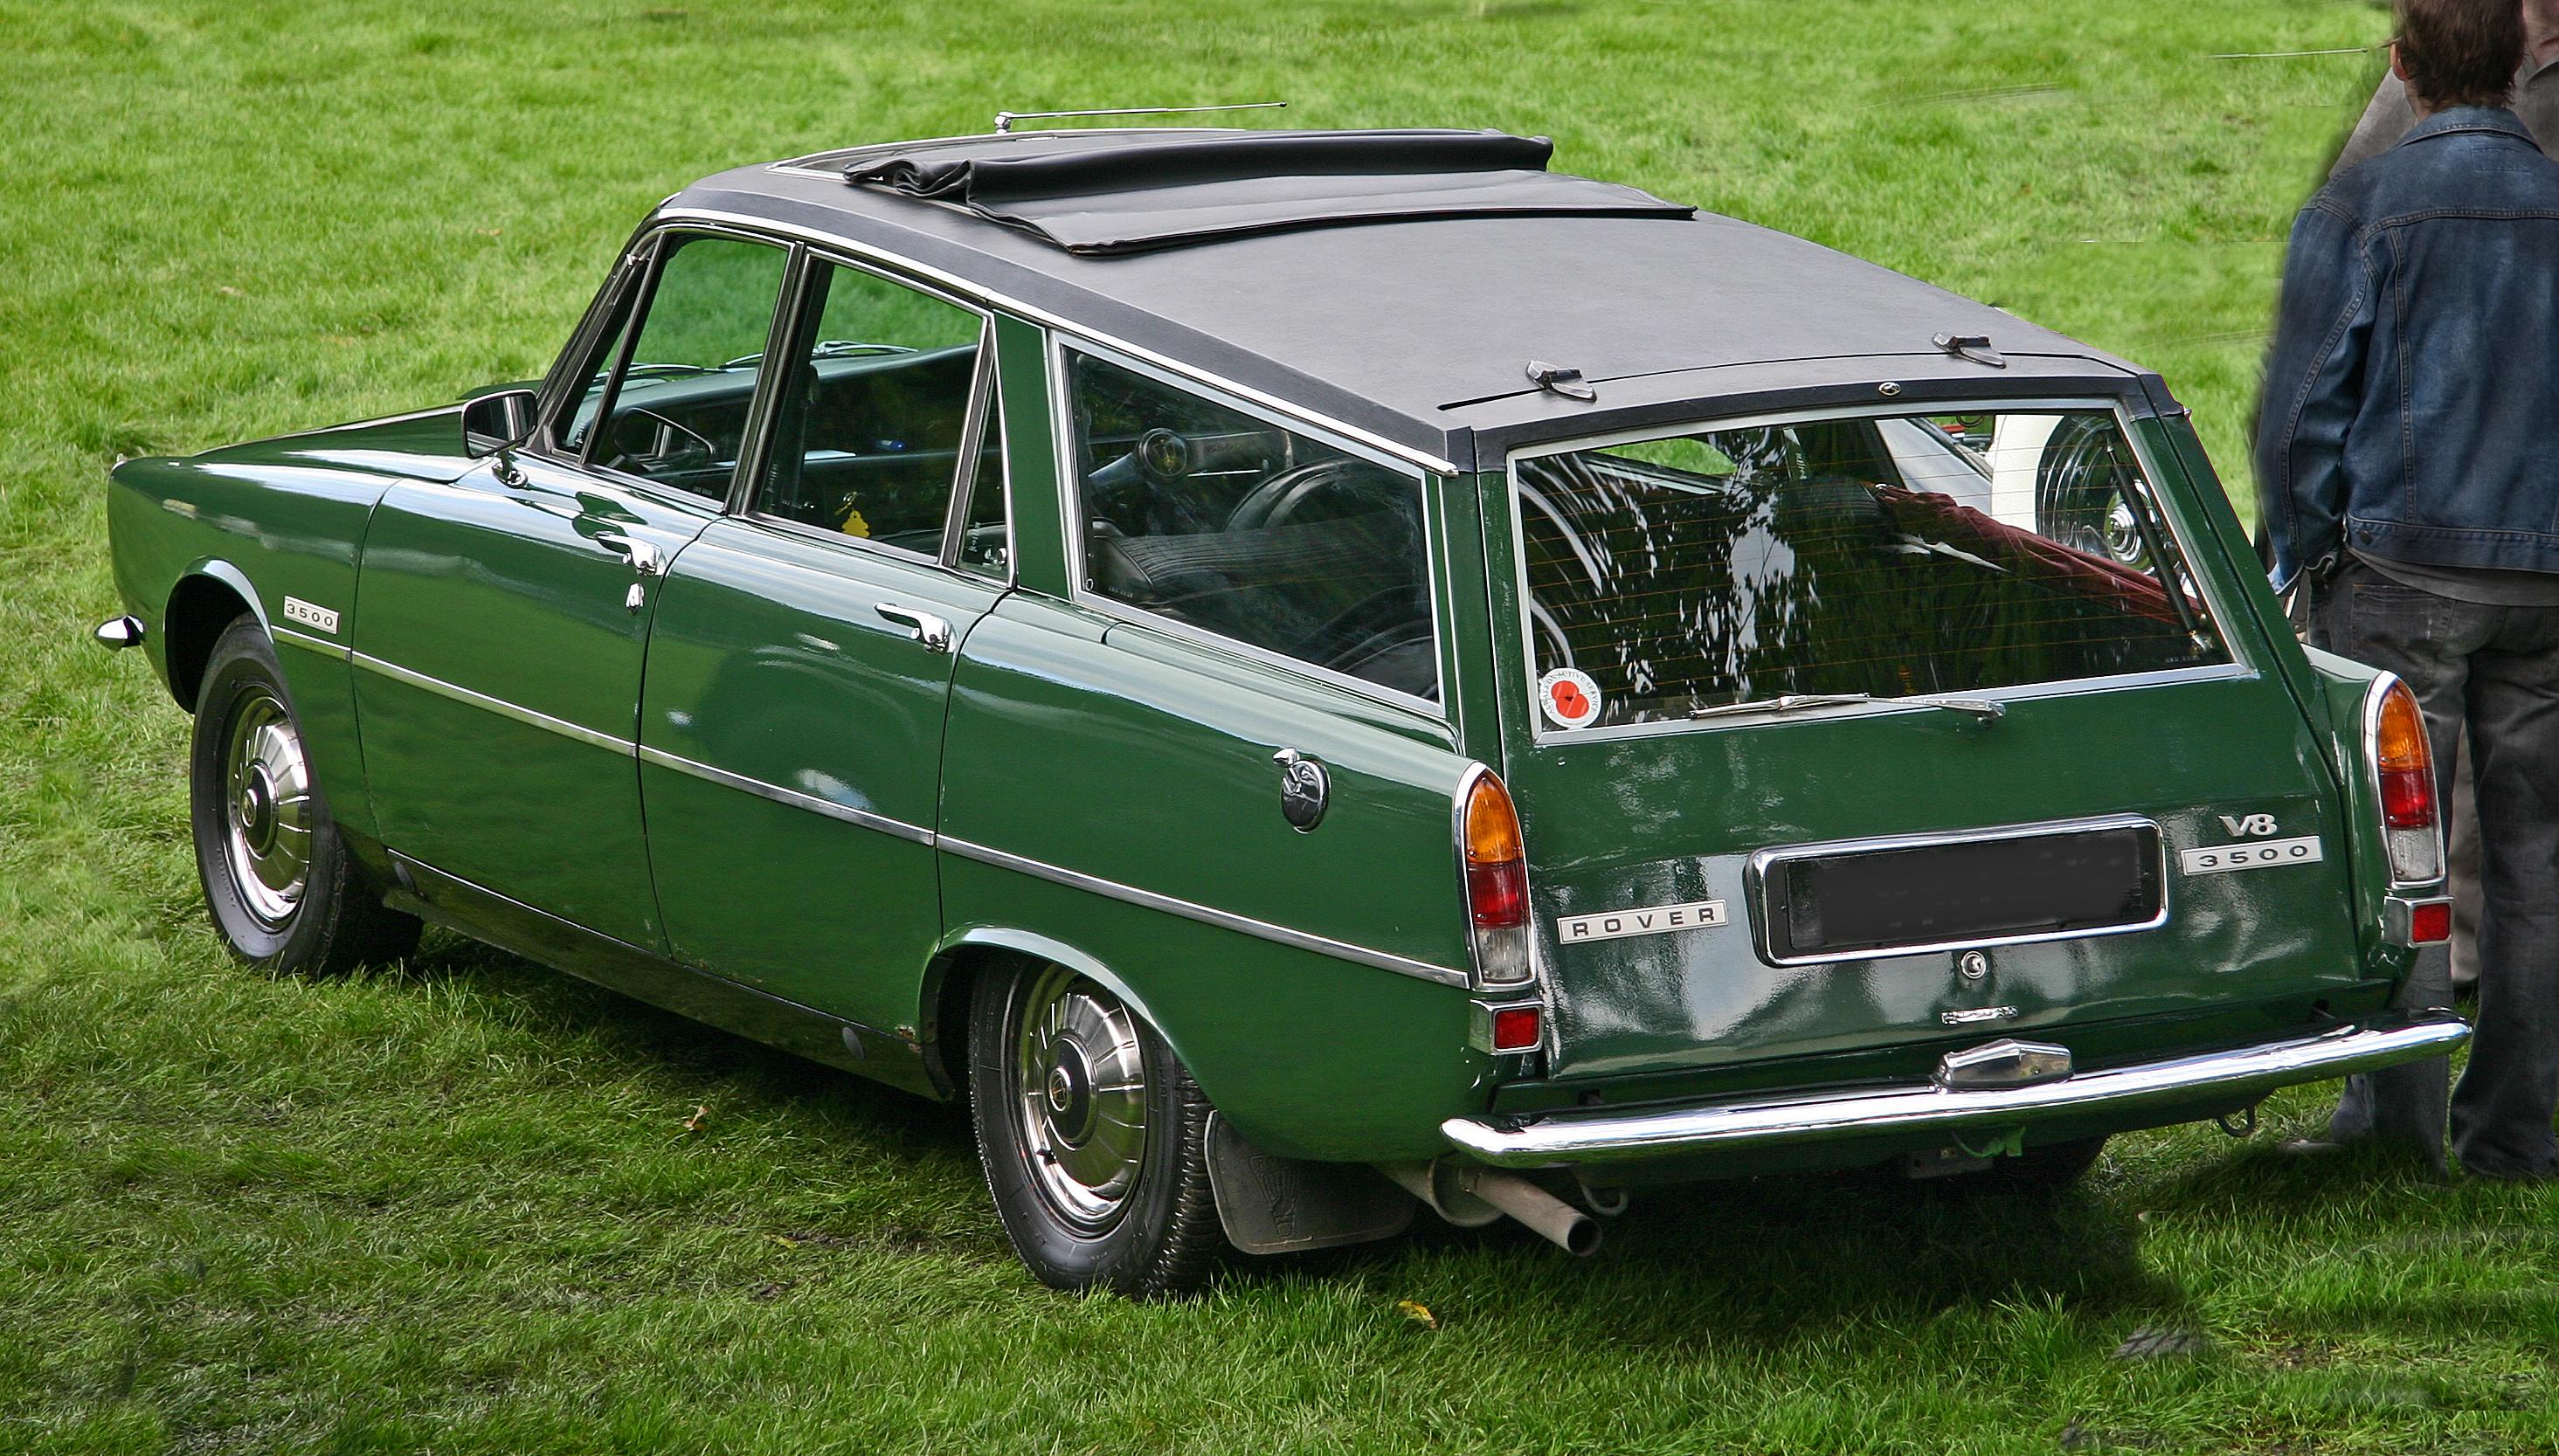 Classic Rover Cars For Sale Australia